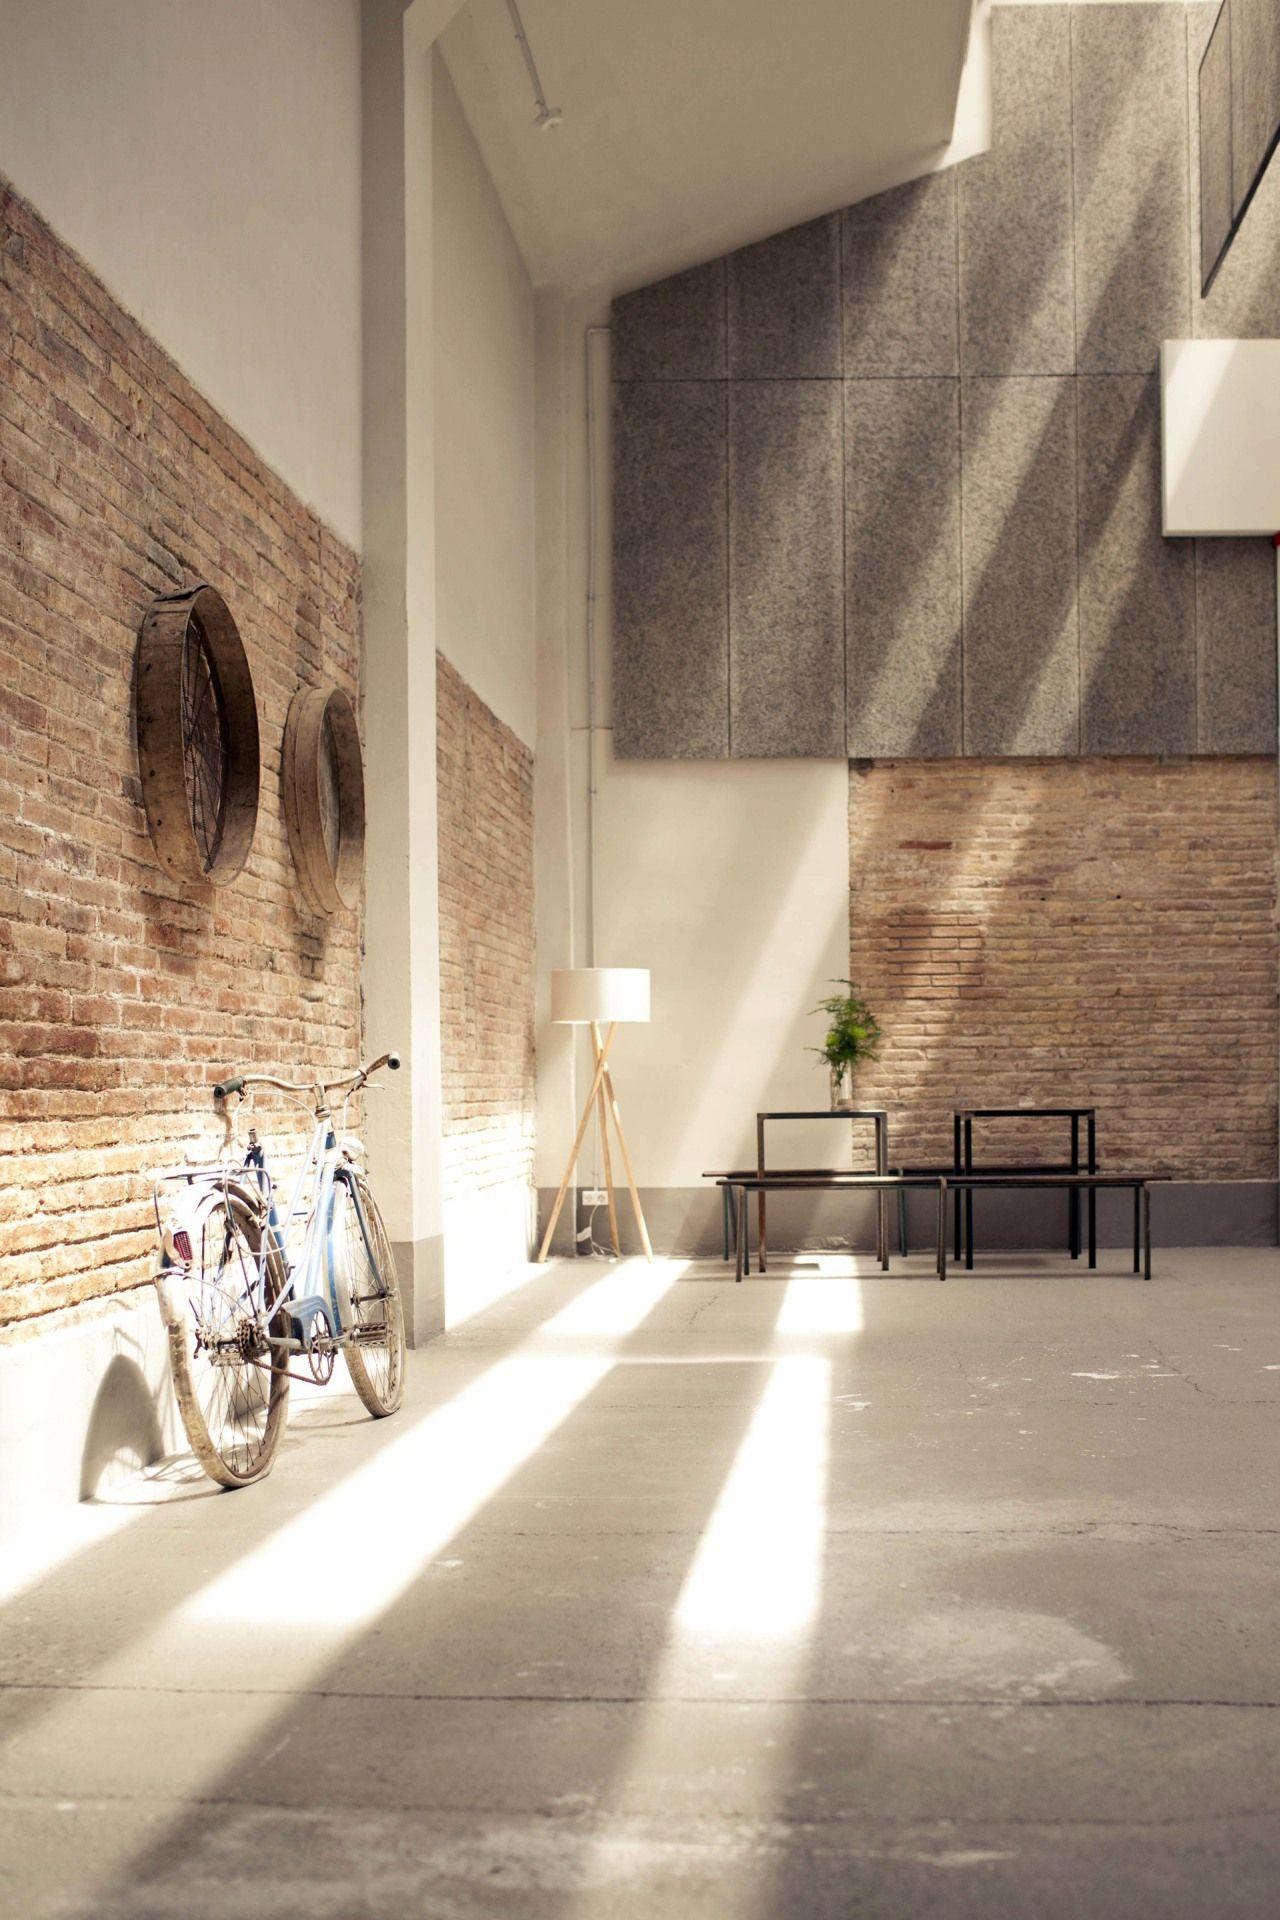 Galeria de ailaic twobo architecture luis twose architect